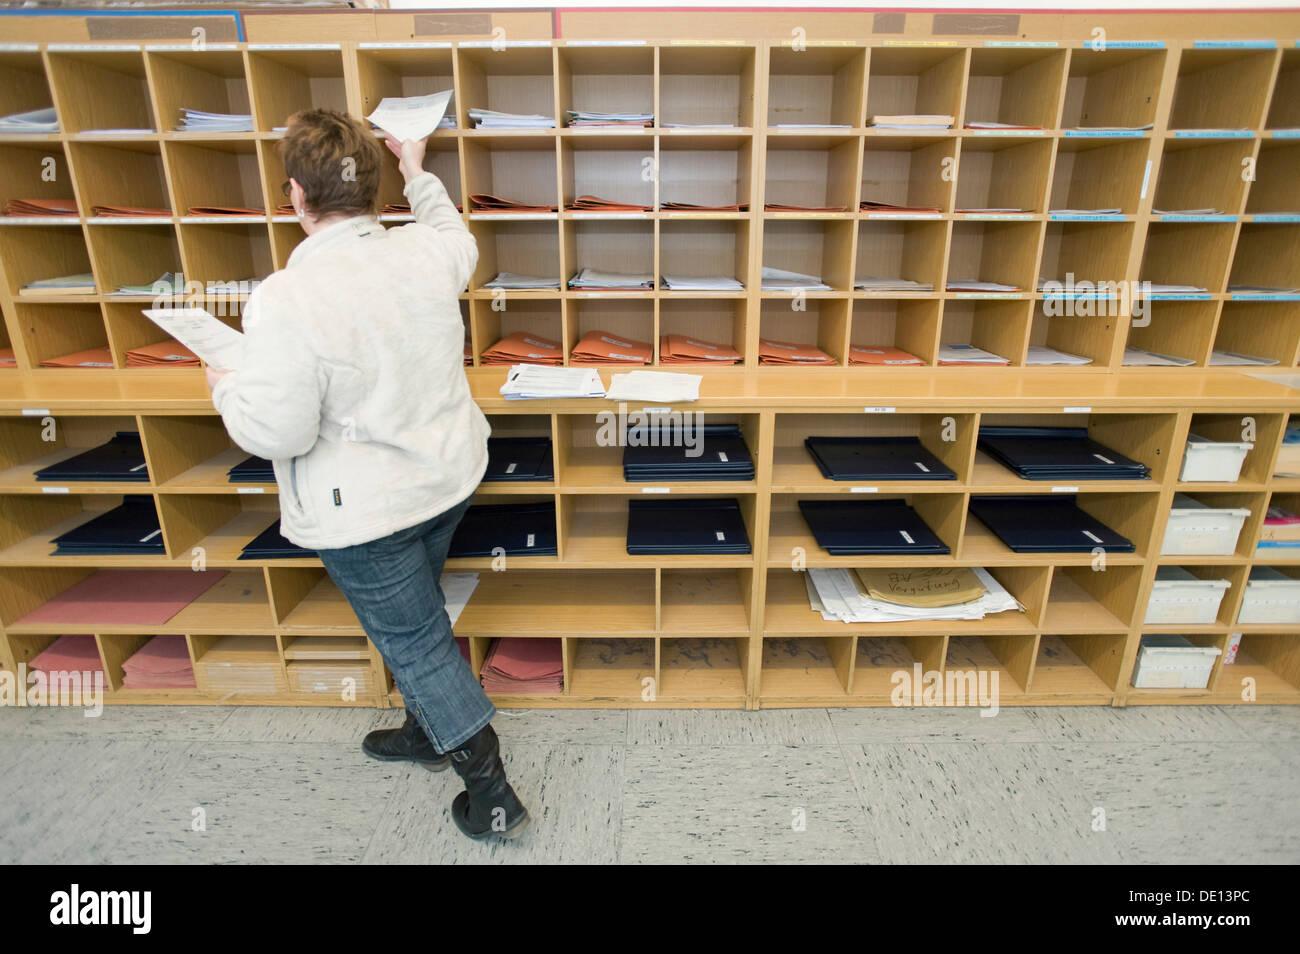 Munich Tax Office II, Post Department, Mail Distribution